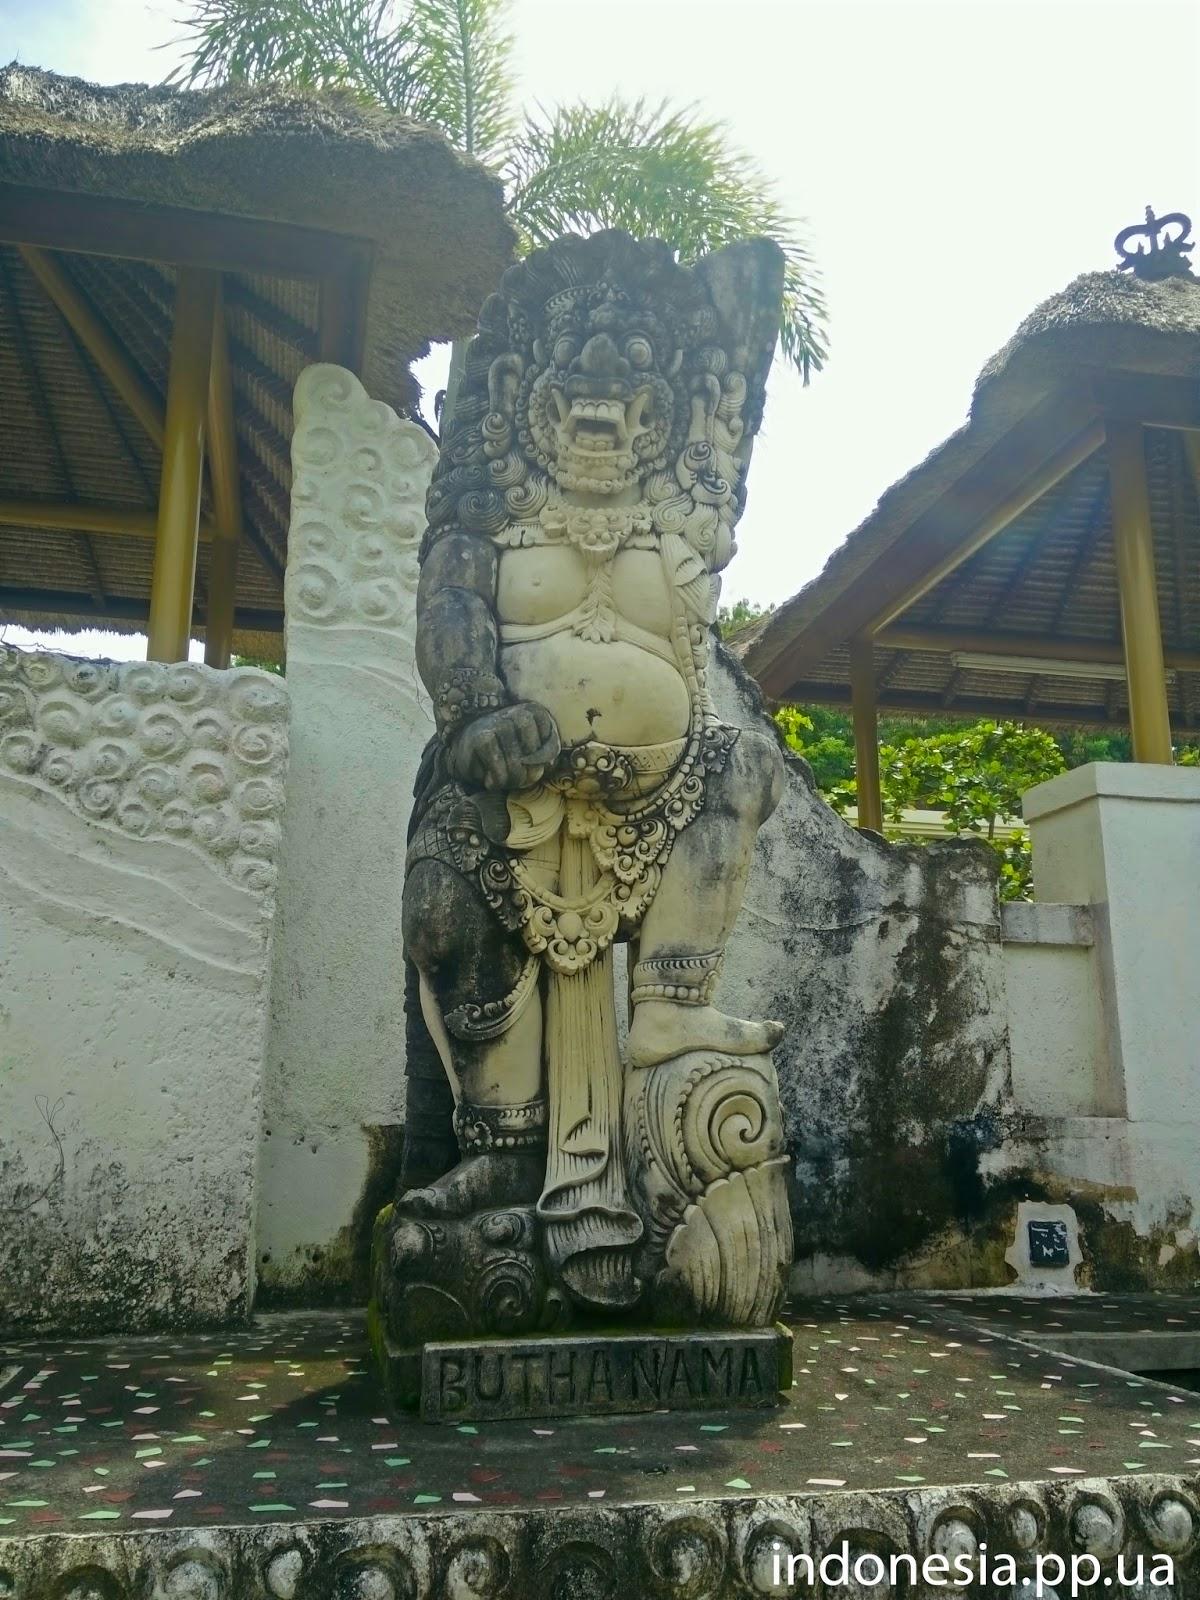 Buthanama